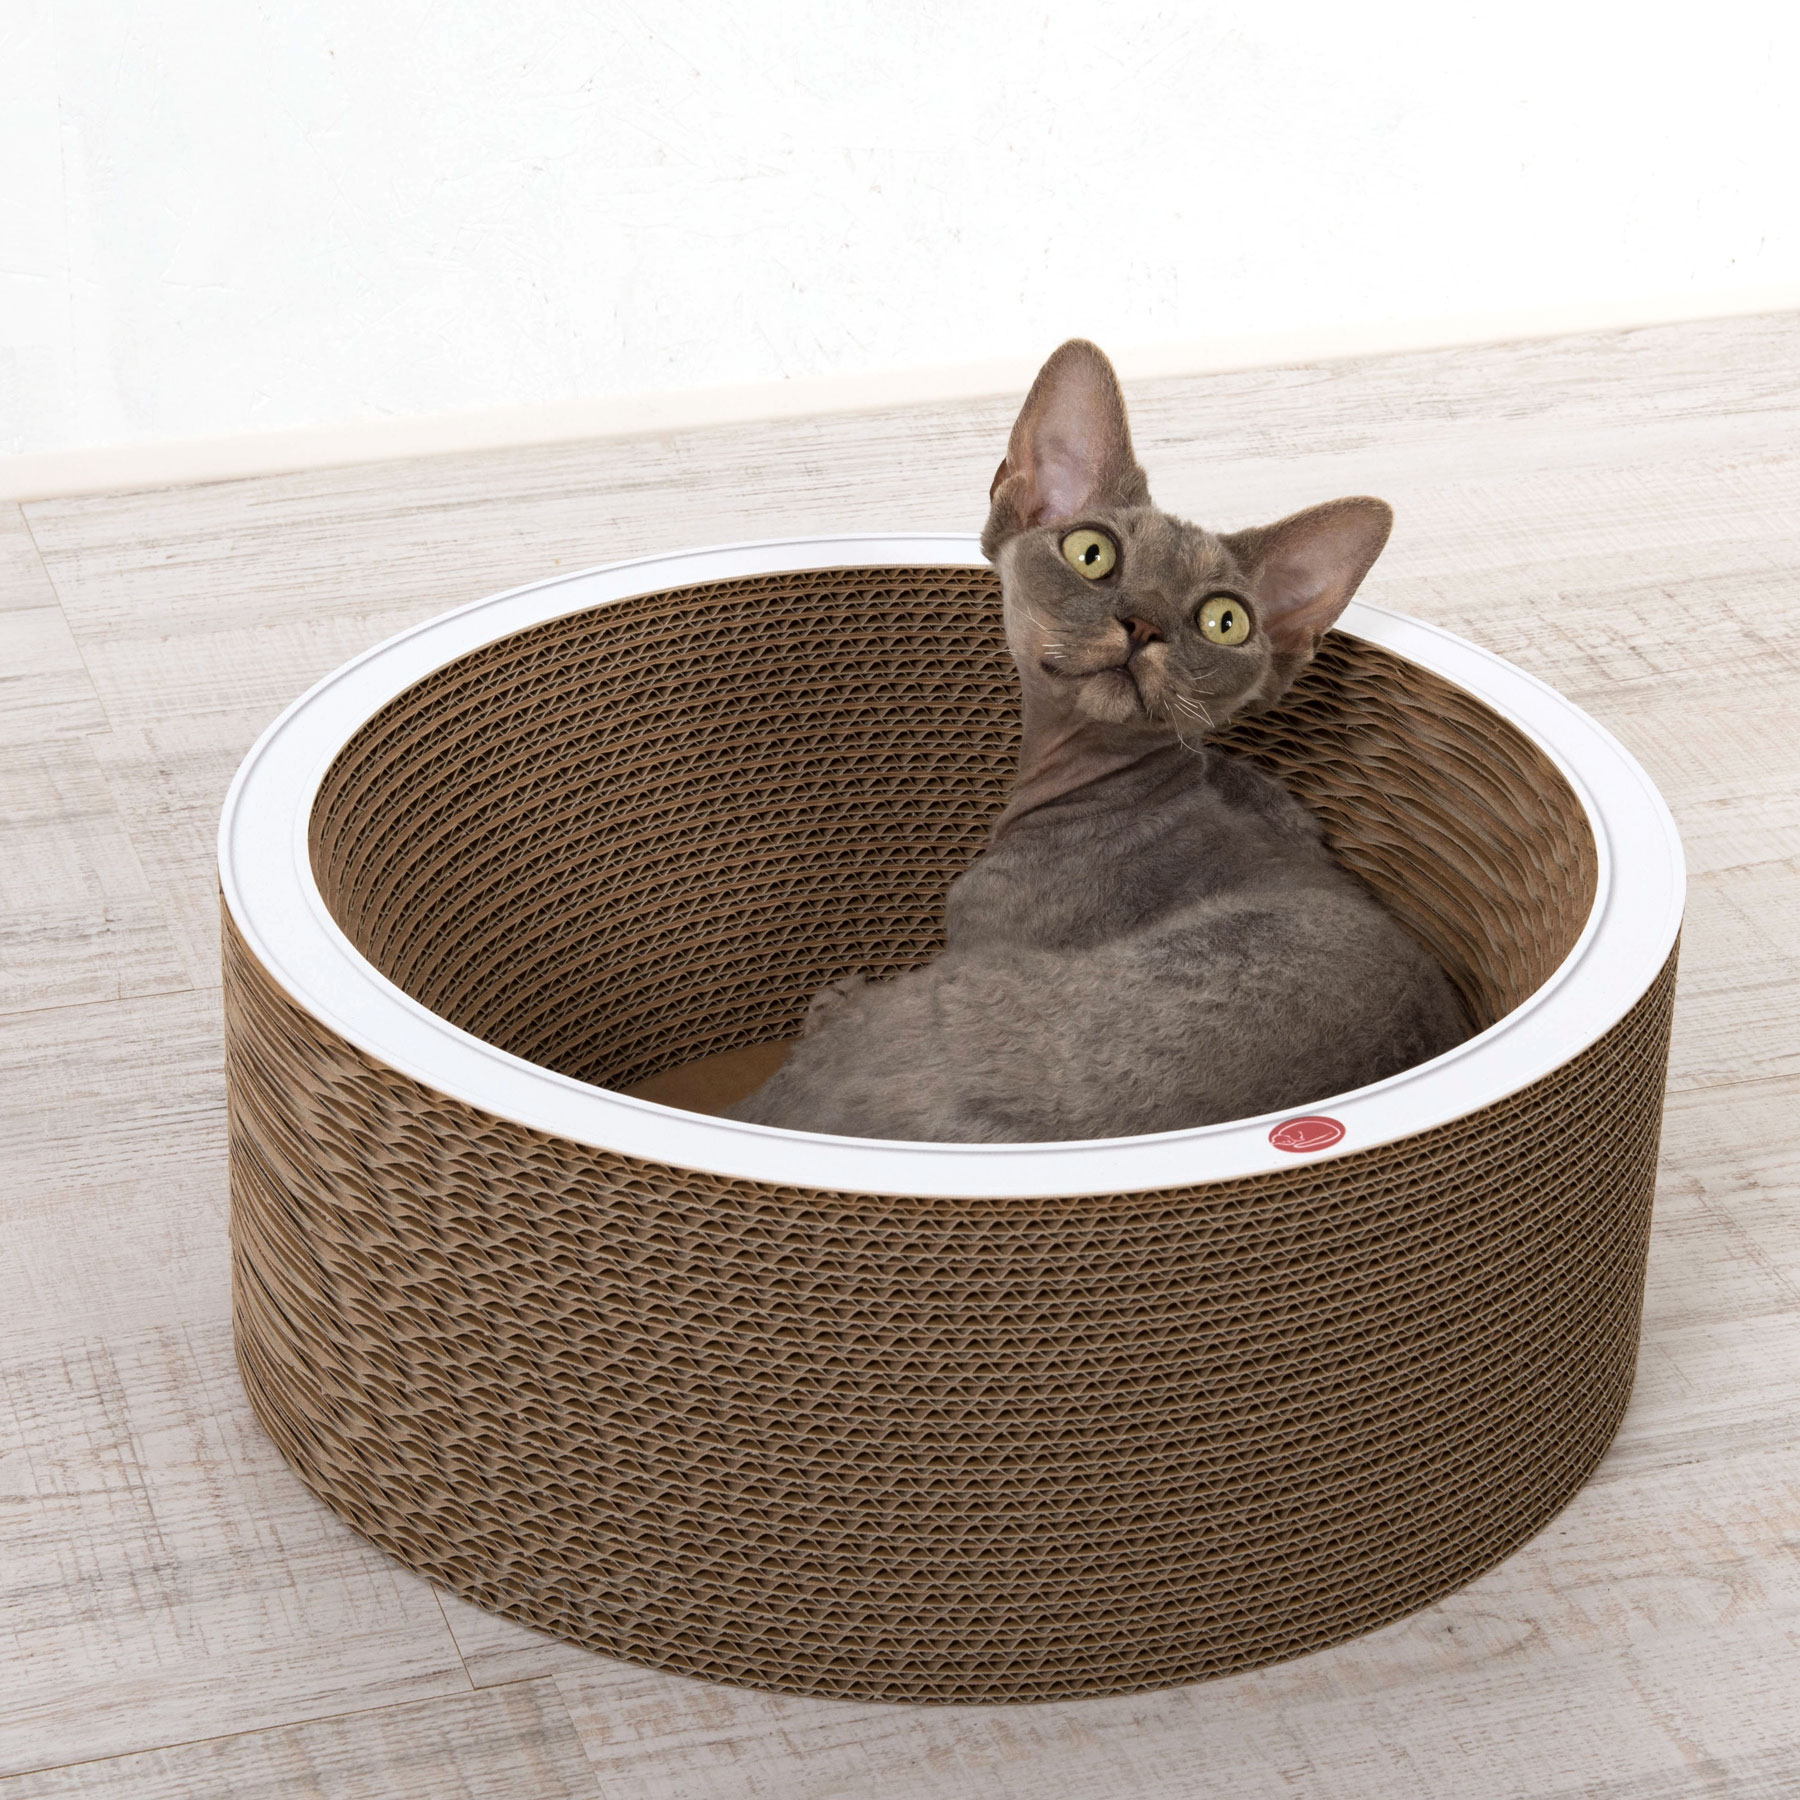 katzenbett bowl aus wellpappe bietet was sich katzen w nschen profeline katzenshop. Black Bedroom Furniture Sets. Home Design Ideas